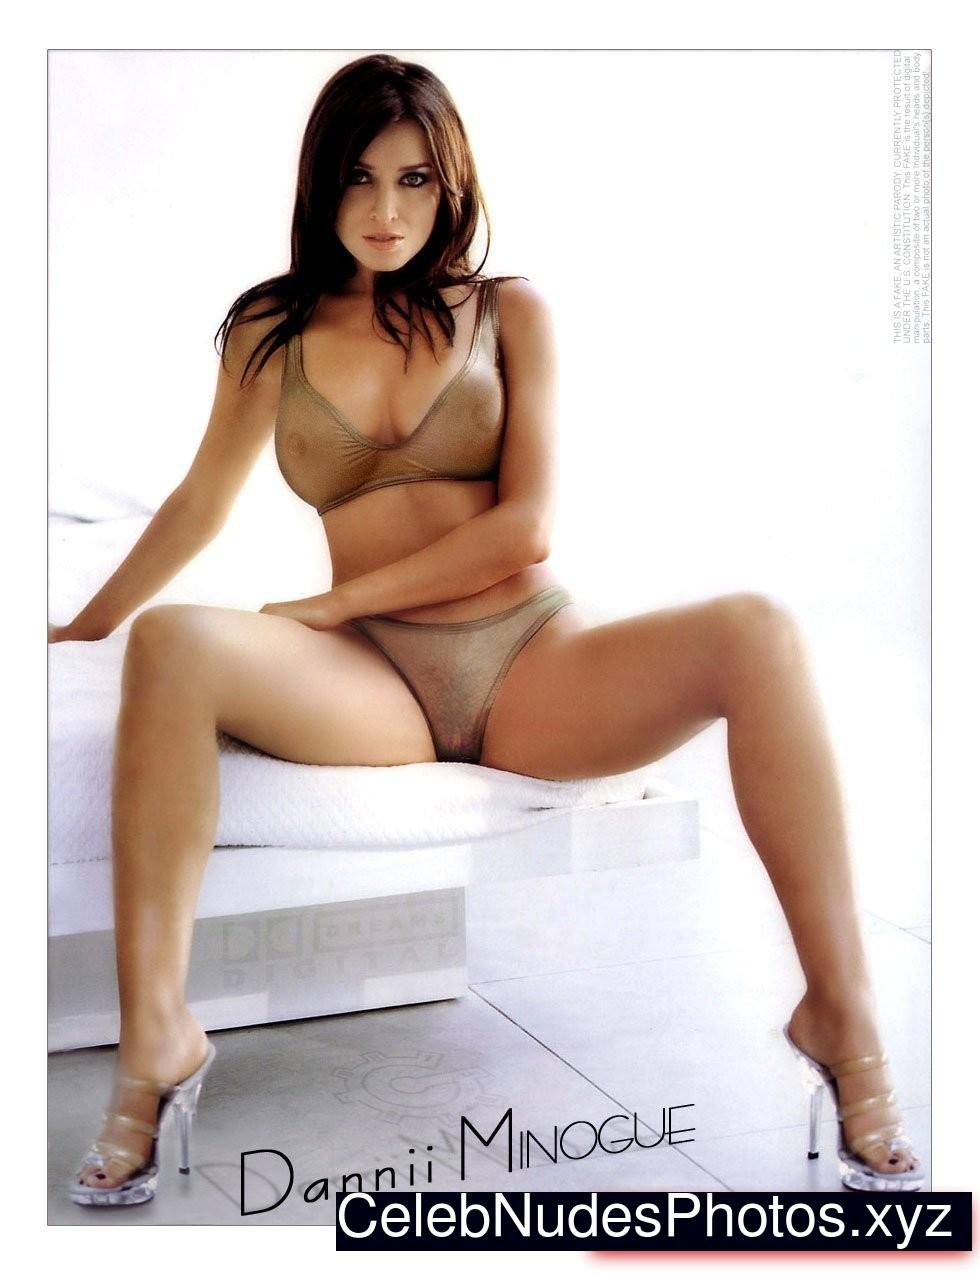 Free Danni Minogue Nude Pics 56